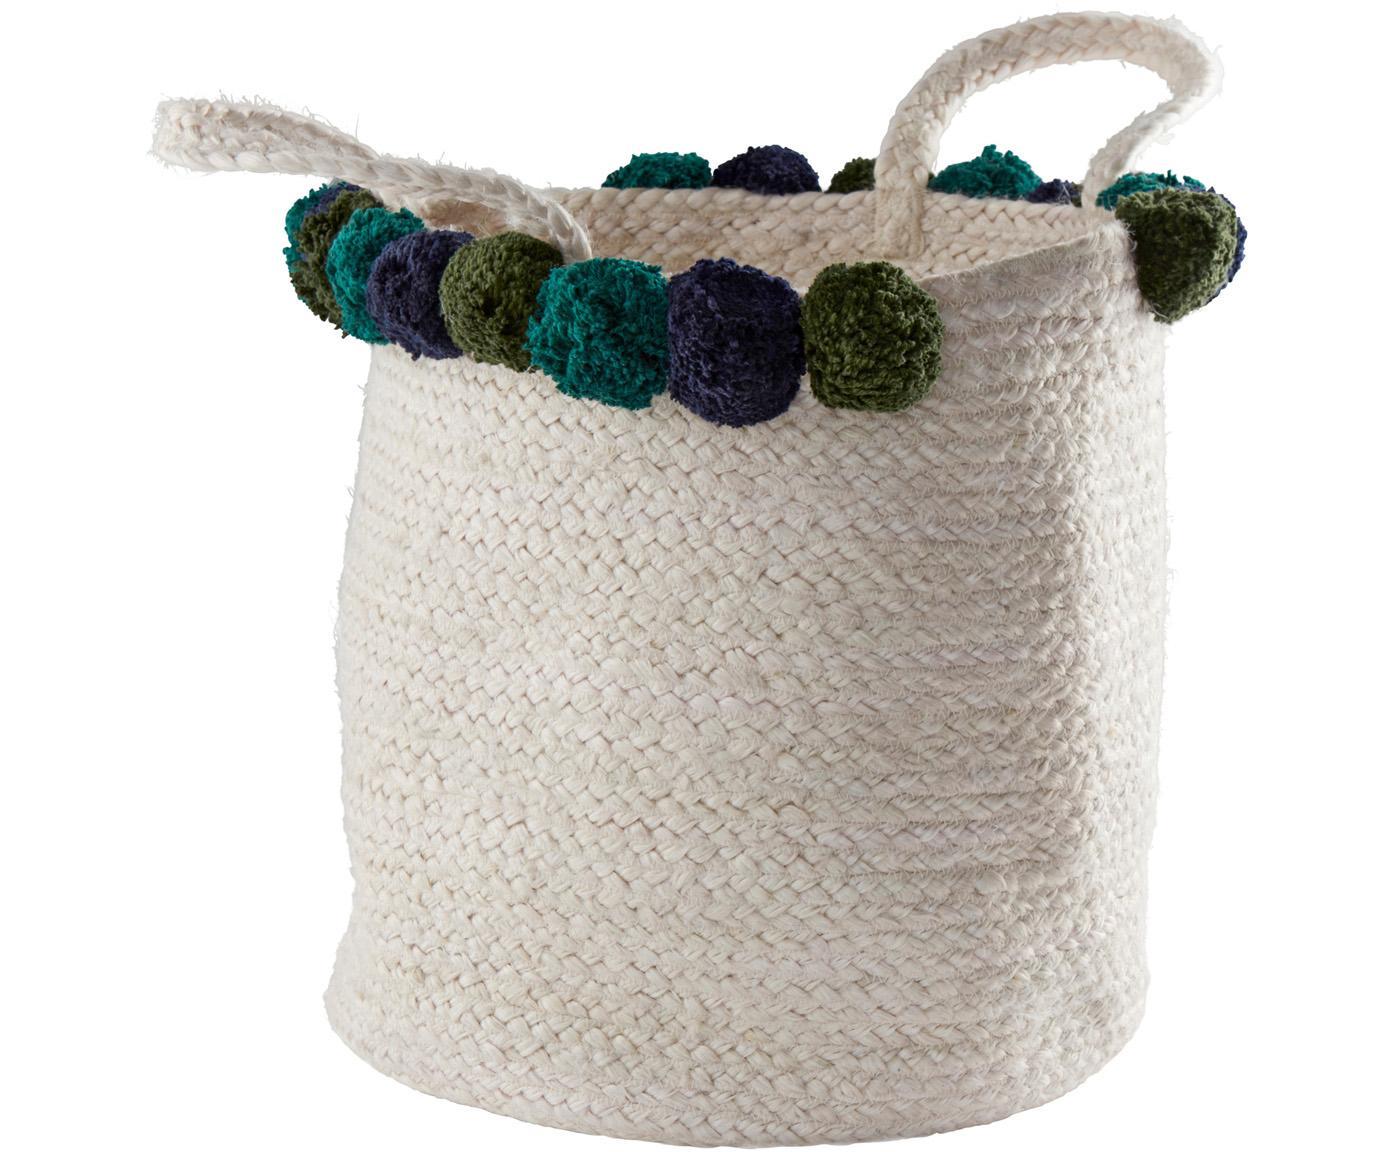 Opbergmand Pompom, Mand: jute, Wit, blauw, groen, Ø 35 cm